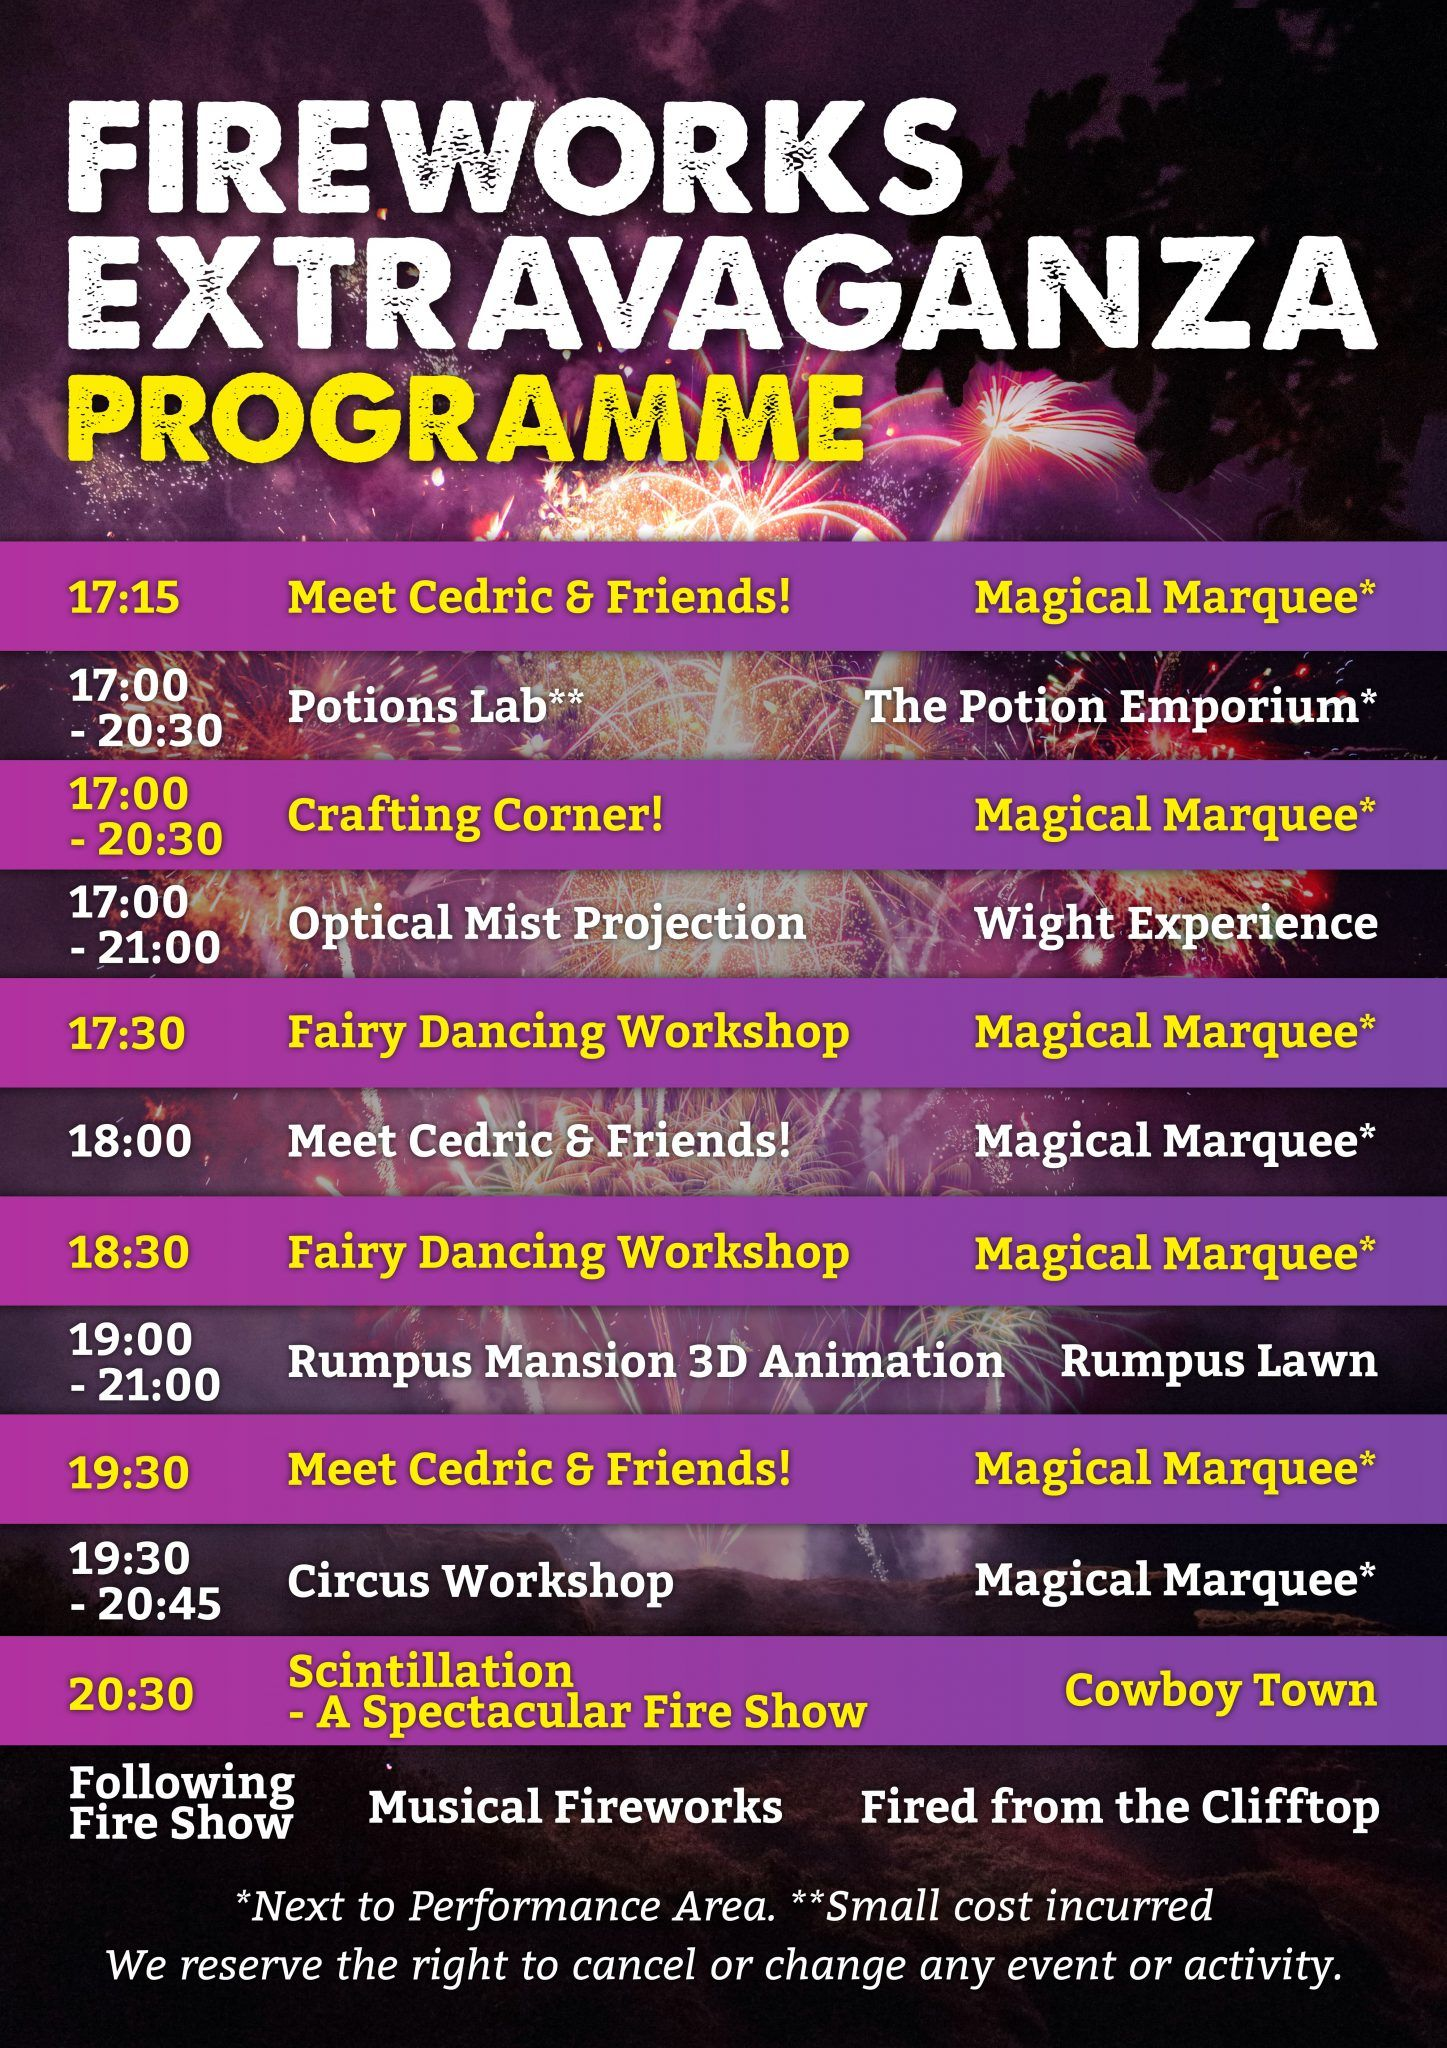 blackgangevent-Foamboard-Fireworks-Extravaganza-Programme-1